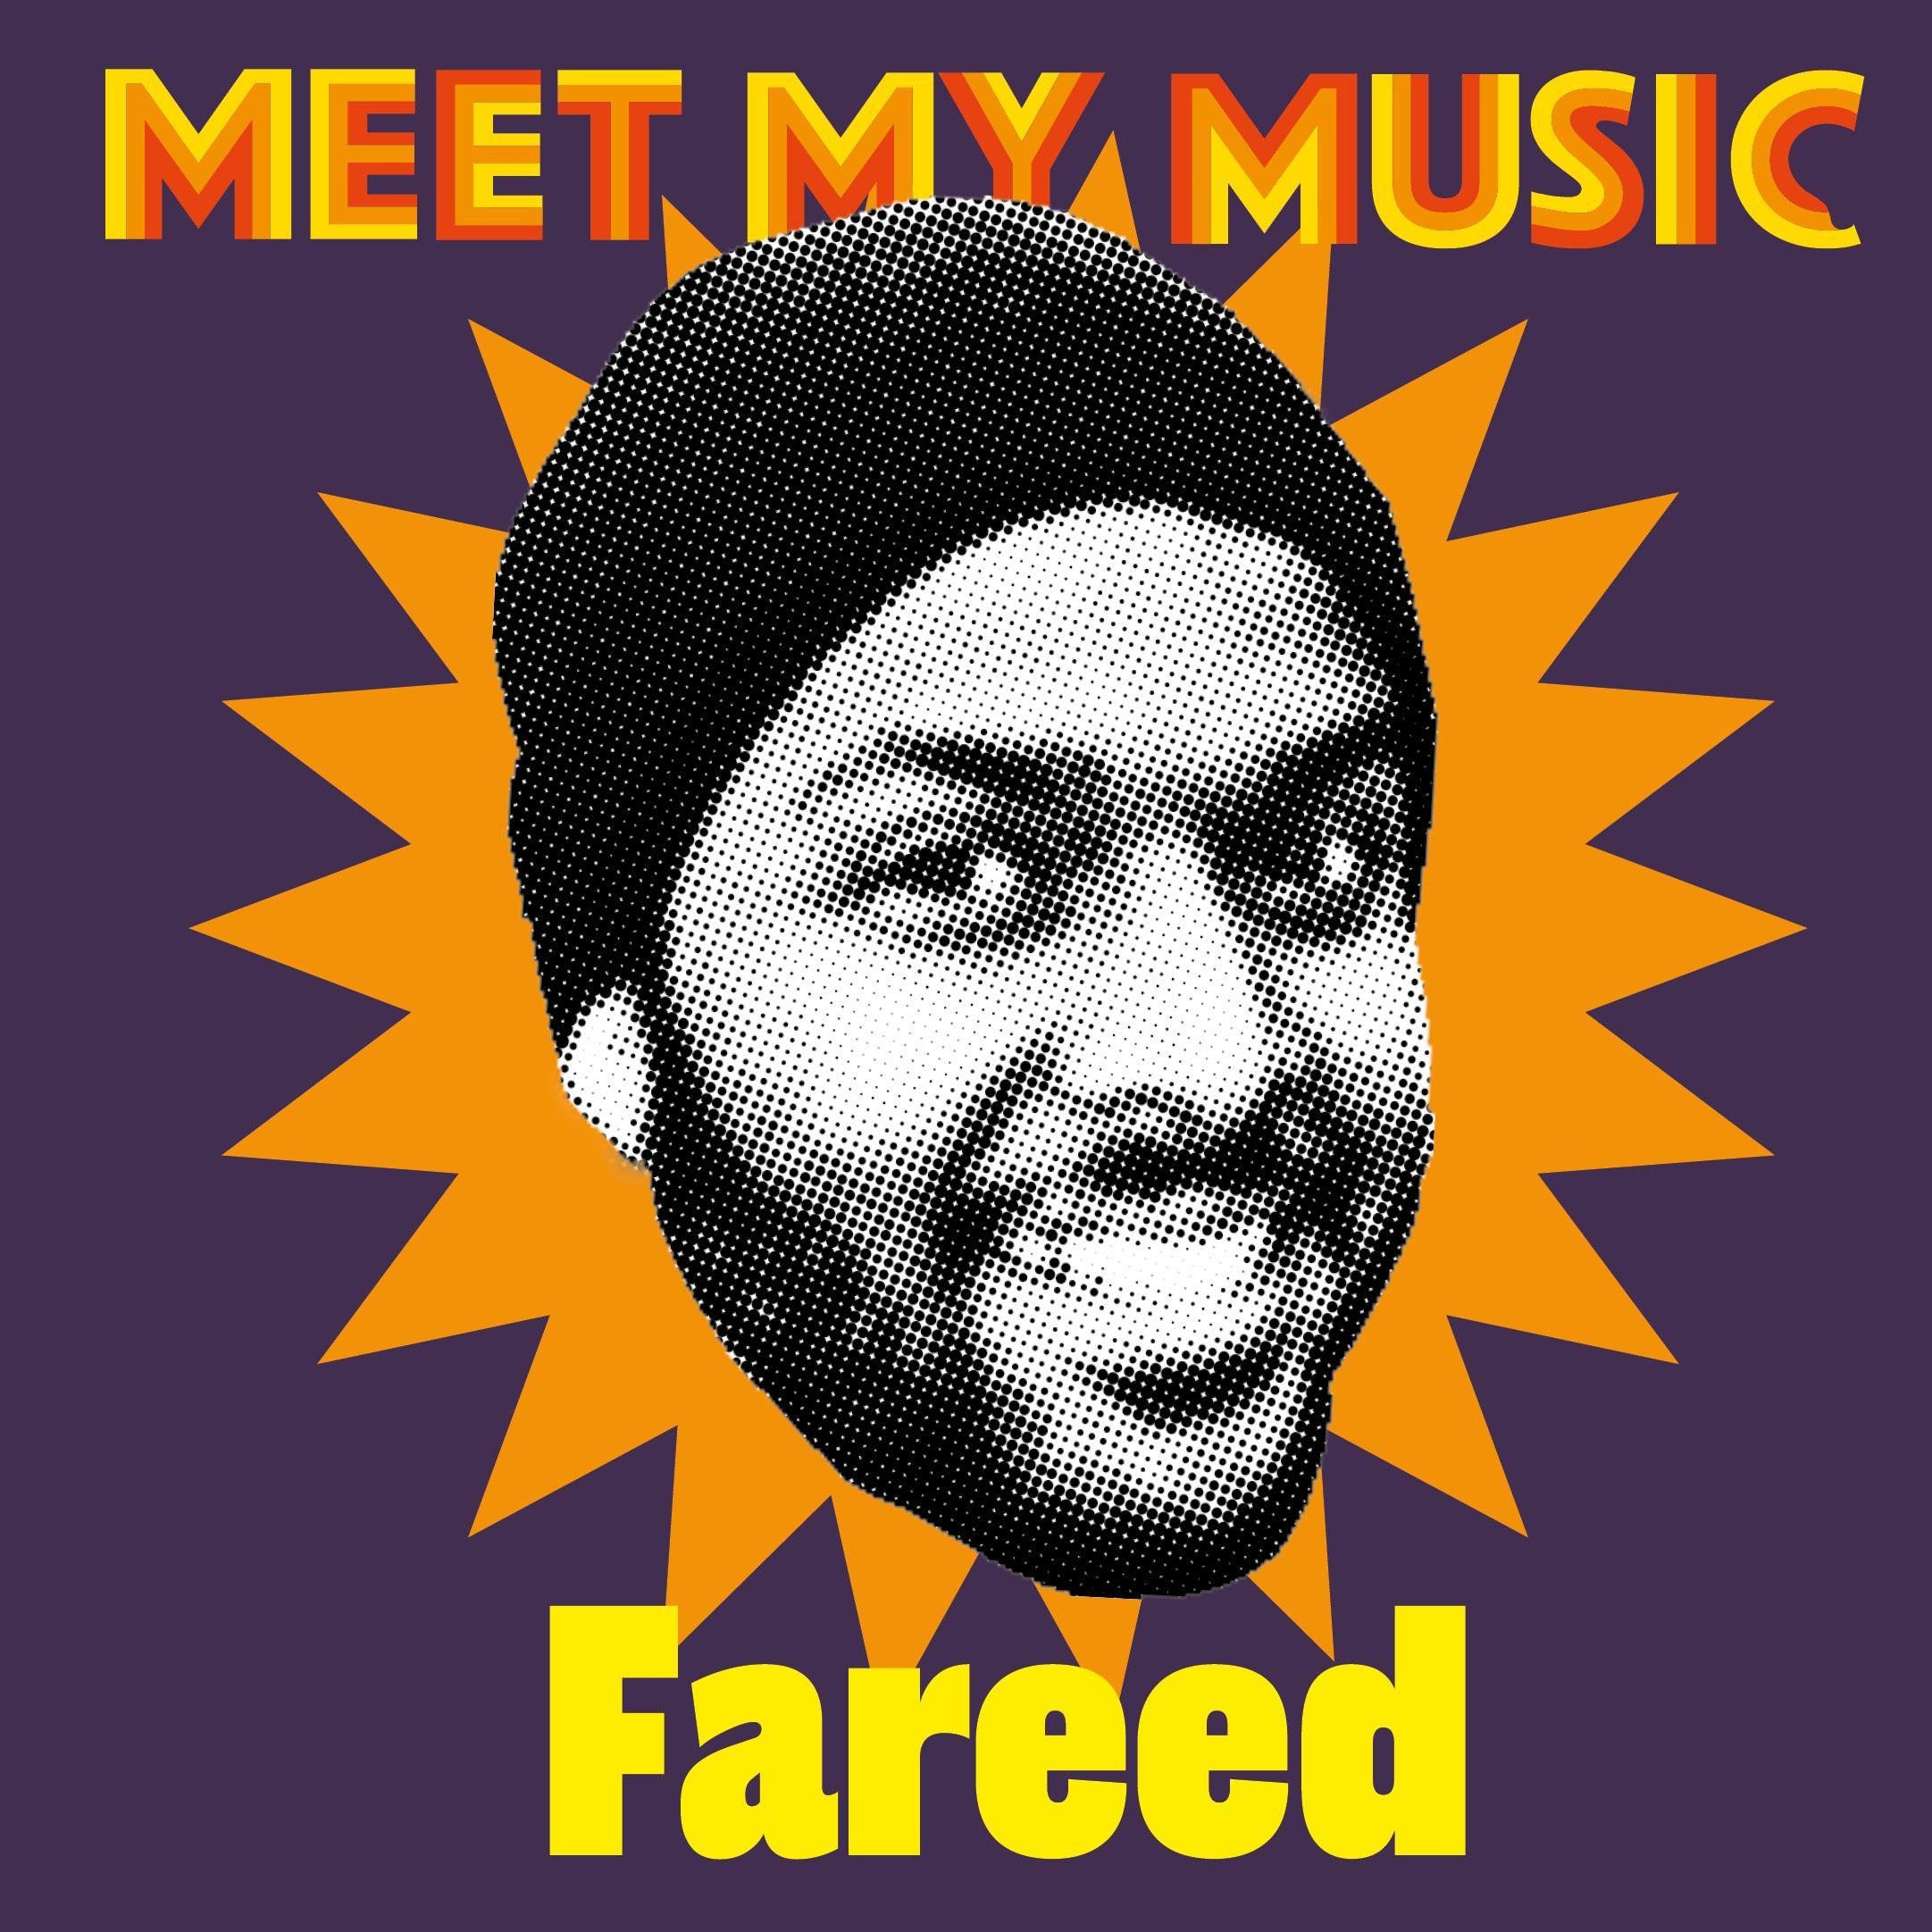 Meet my music Fareed 185.jpg